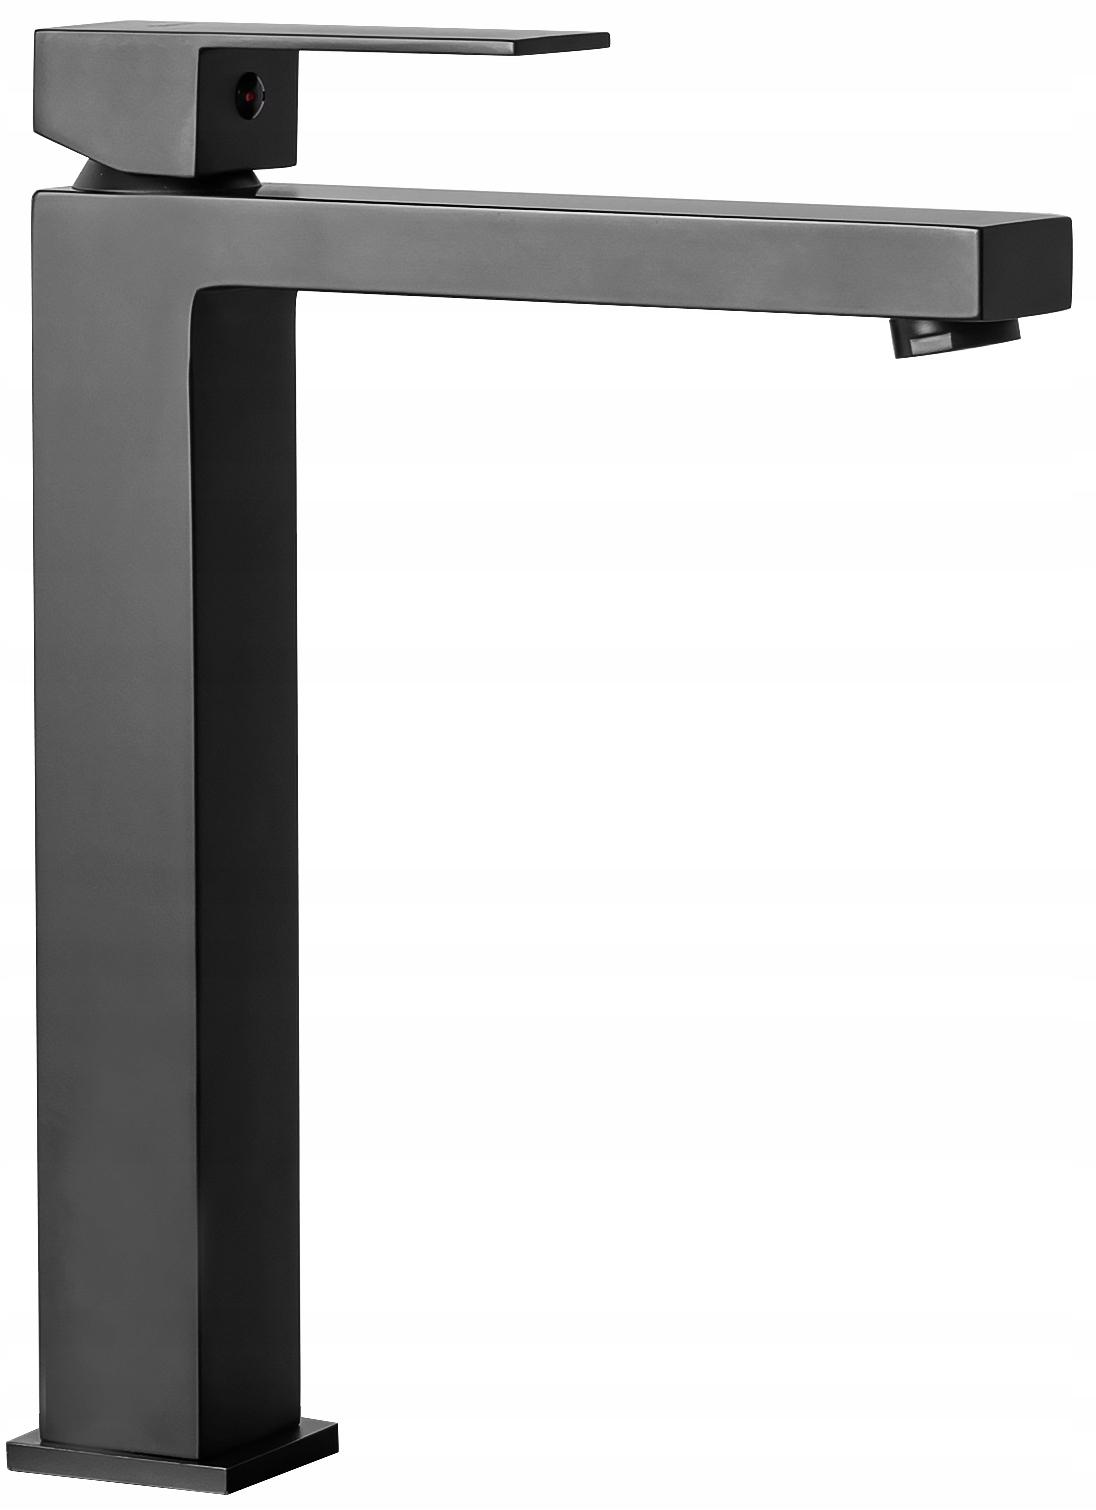 Umyvadlová batéria RI FENIX BLACK H umývadlo vysoký kohútik, čierna